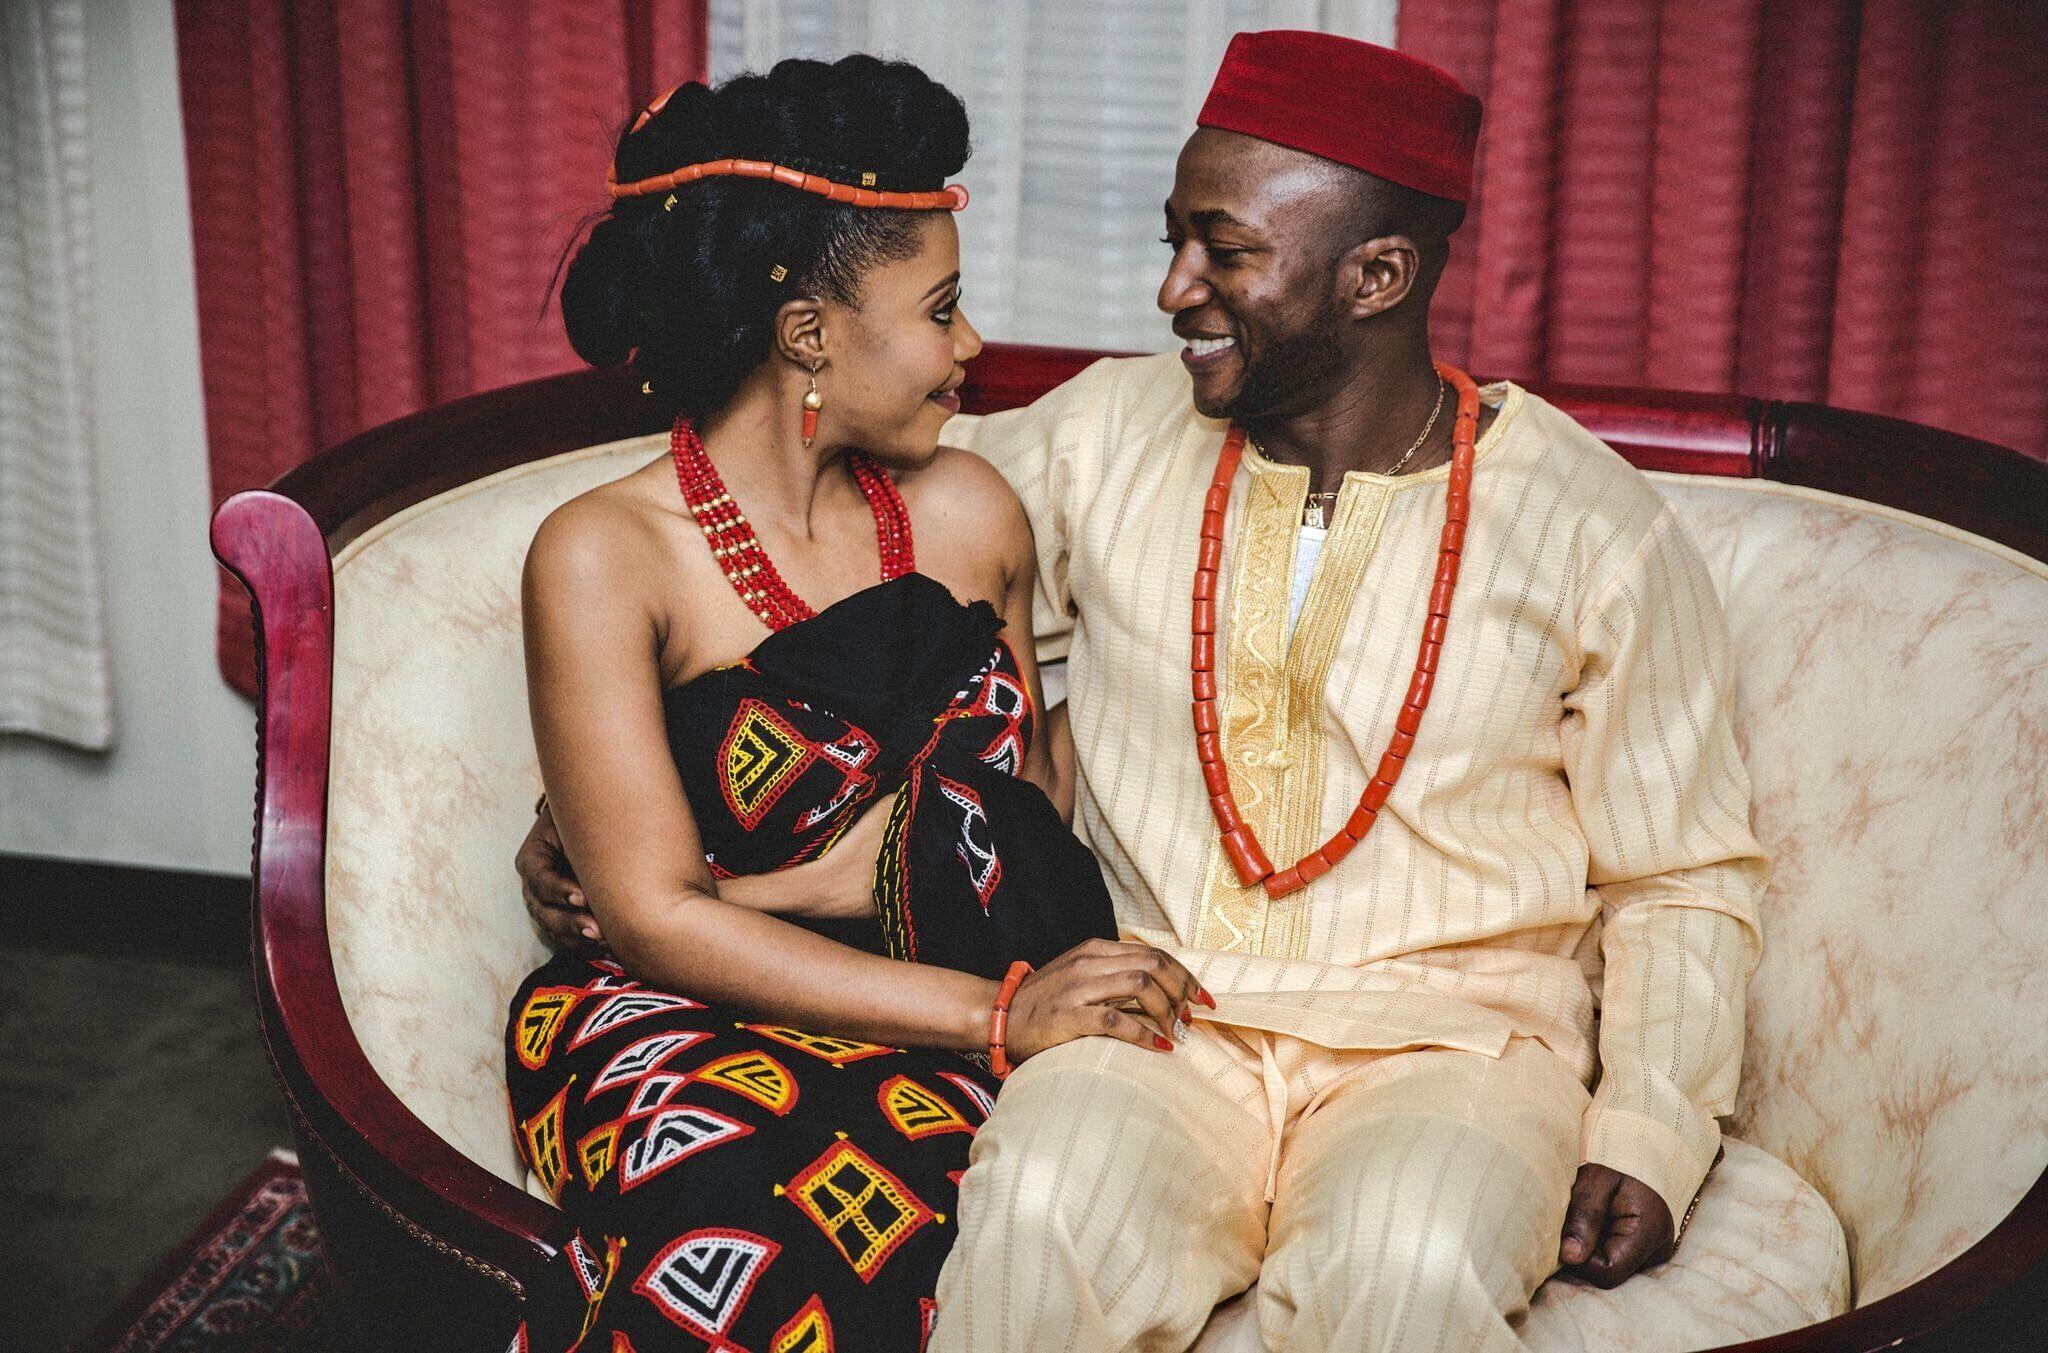 Cameroon Traditional Wedding Cameroon Attire Bamenda Wear African Attire Traditional Wedding Traditional Wedding African Attire Wedding